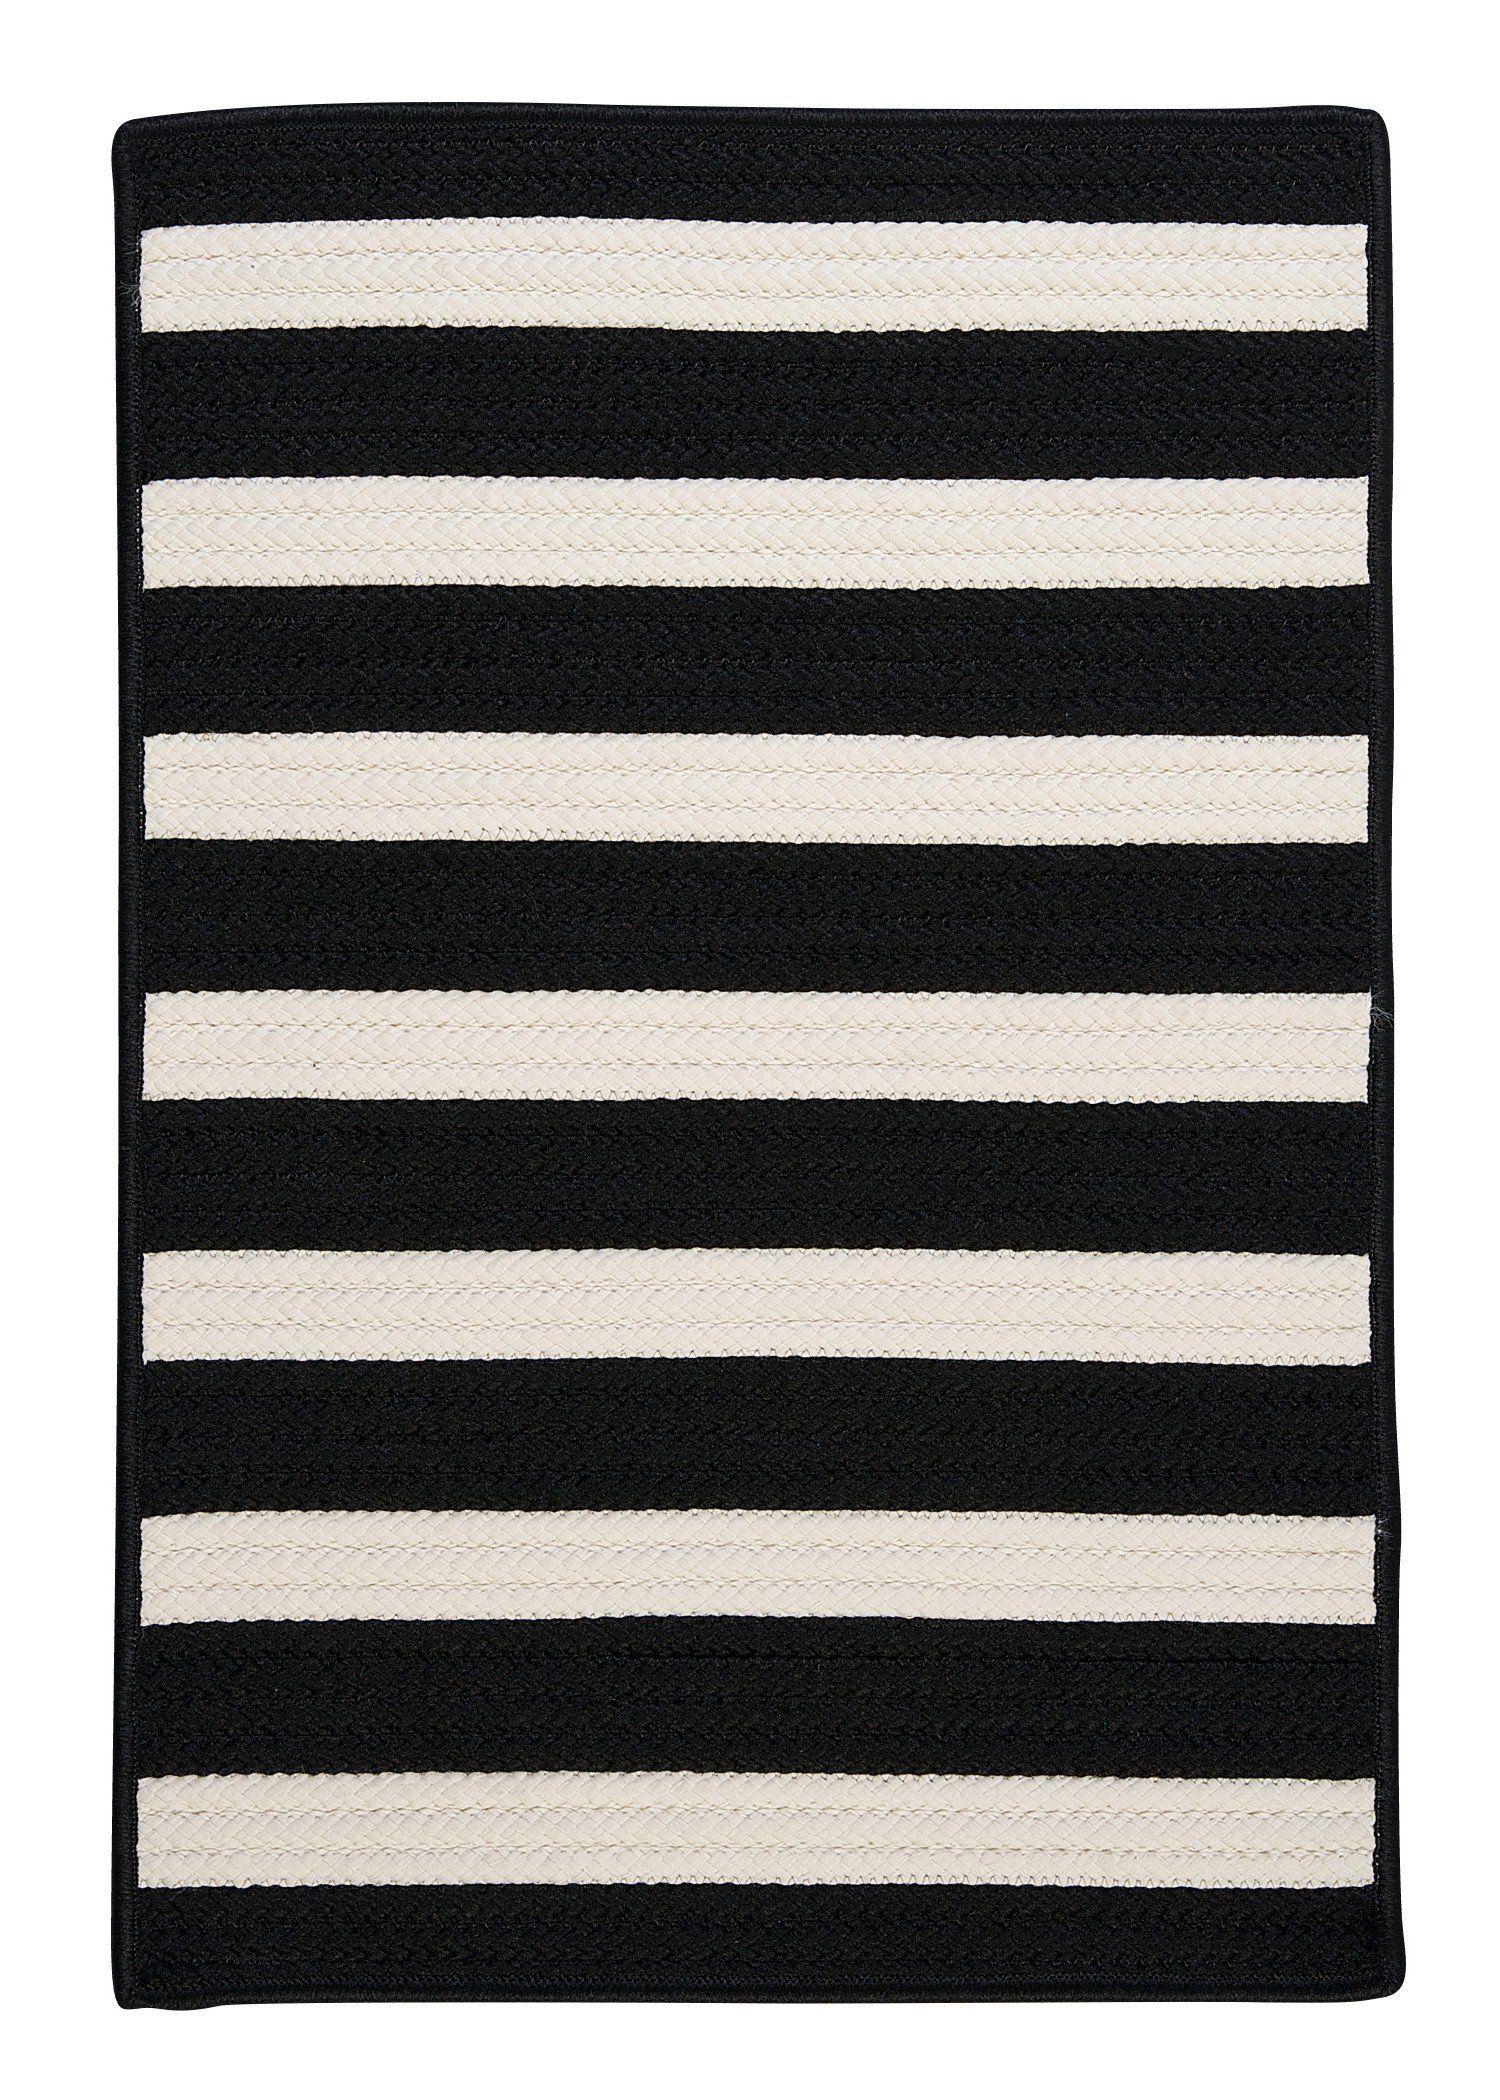 Colonial Mills Stripe It Tr89 Black White Indooroutdoor Area Rug